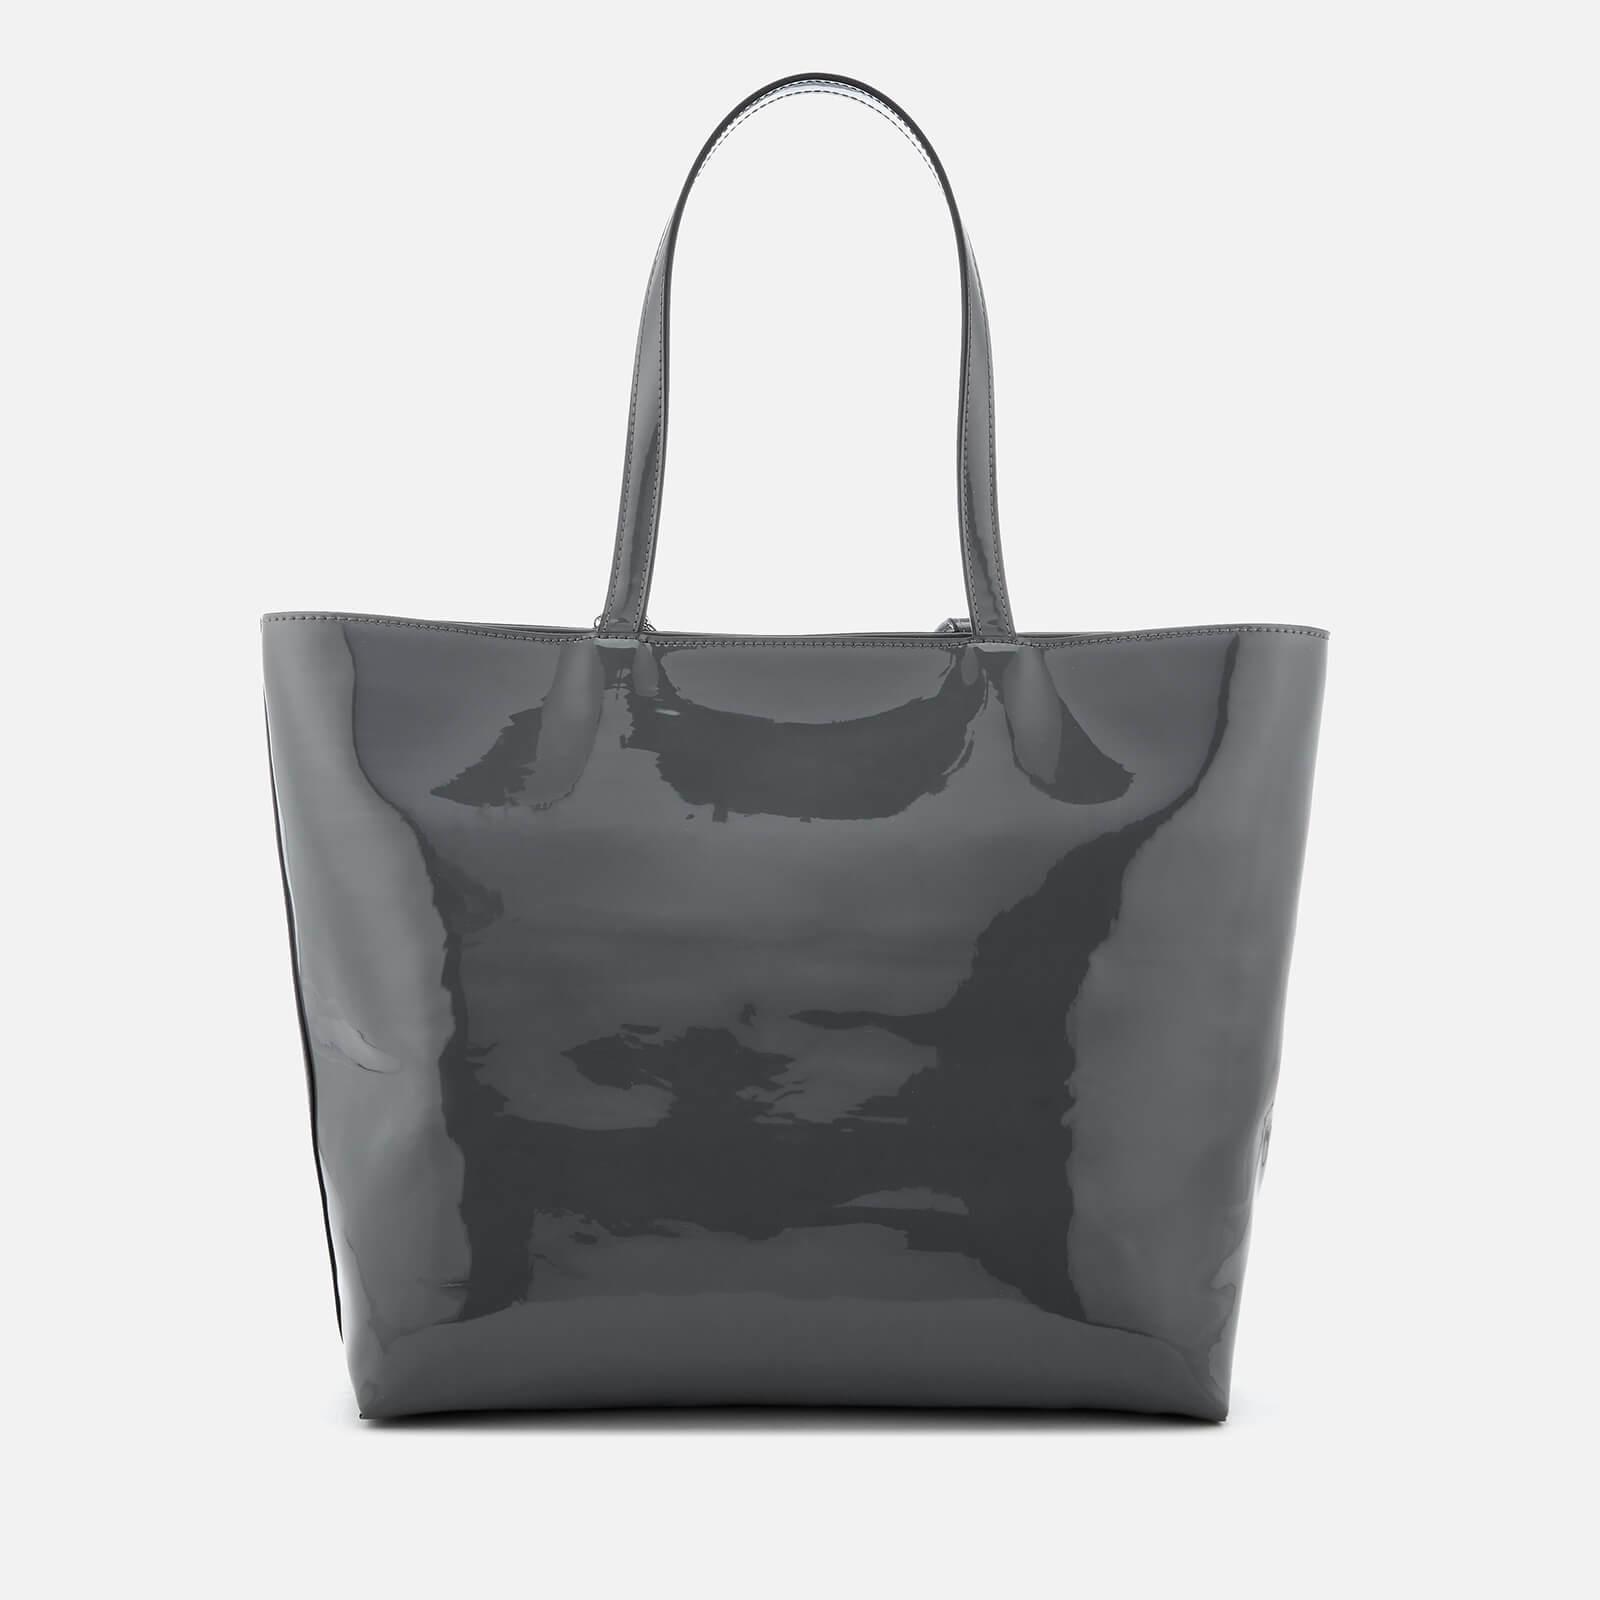 2c6d6d59eb Lyst - Armani Exchange Patent Logo Tote Bag in Black